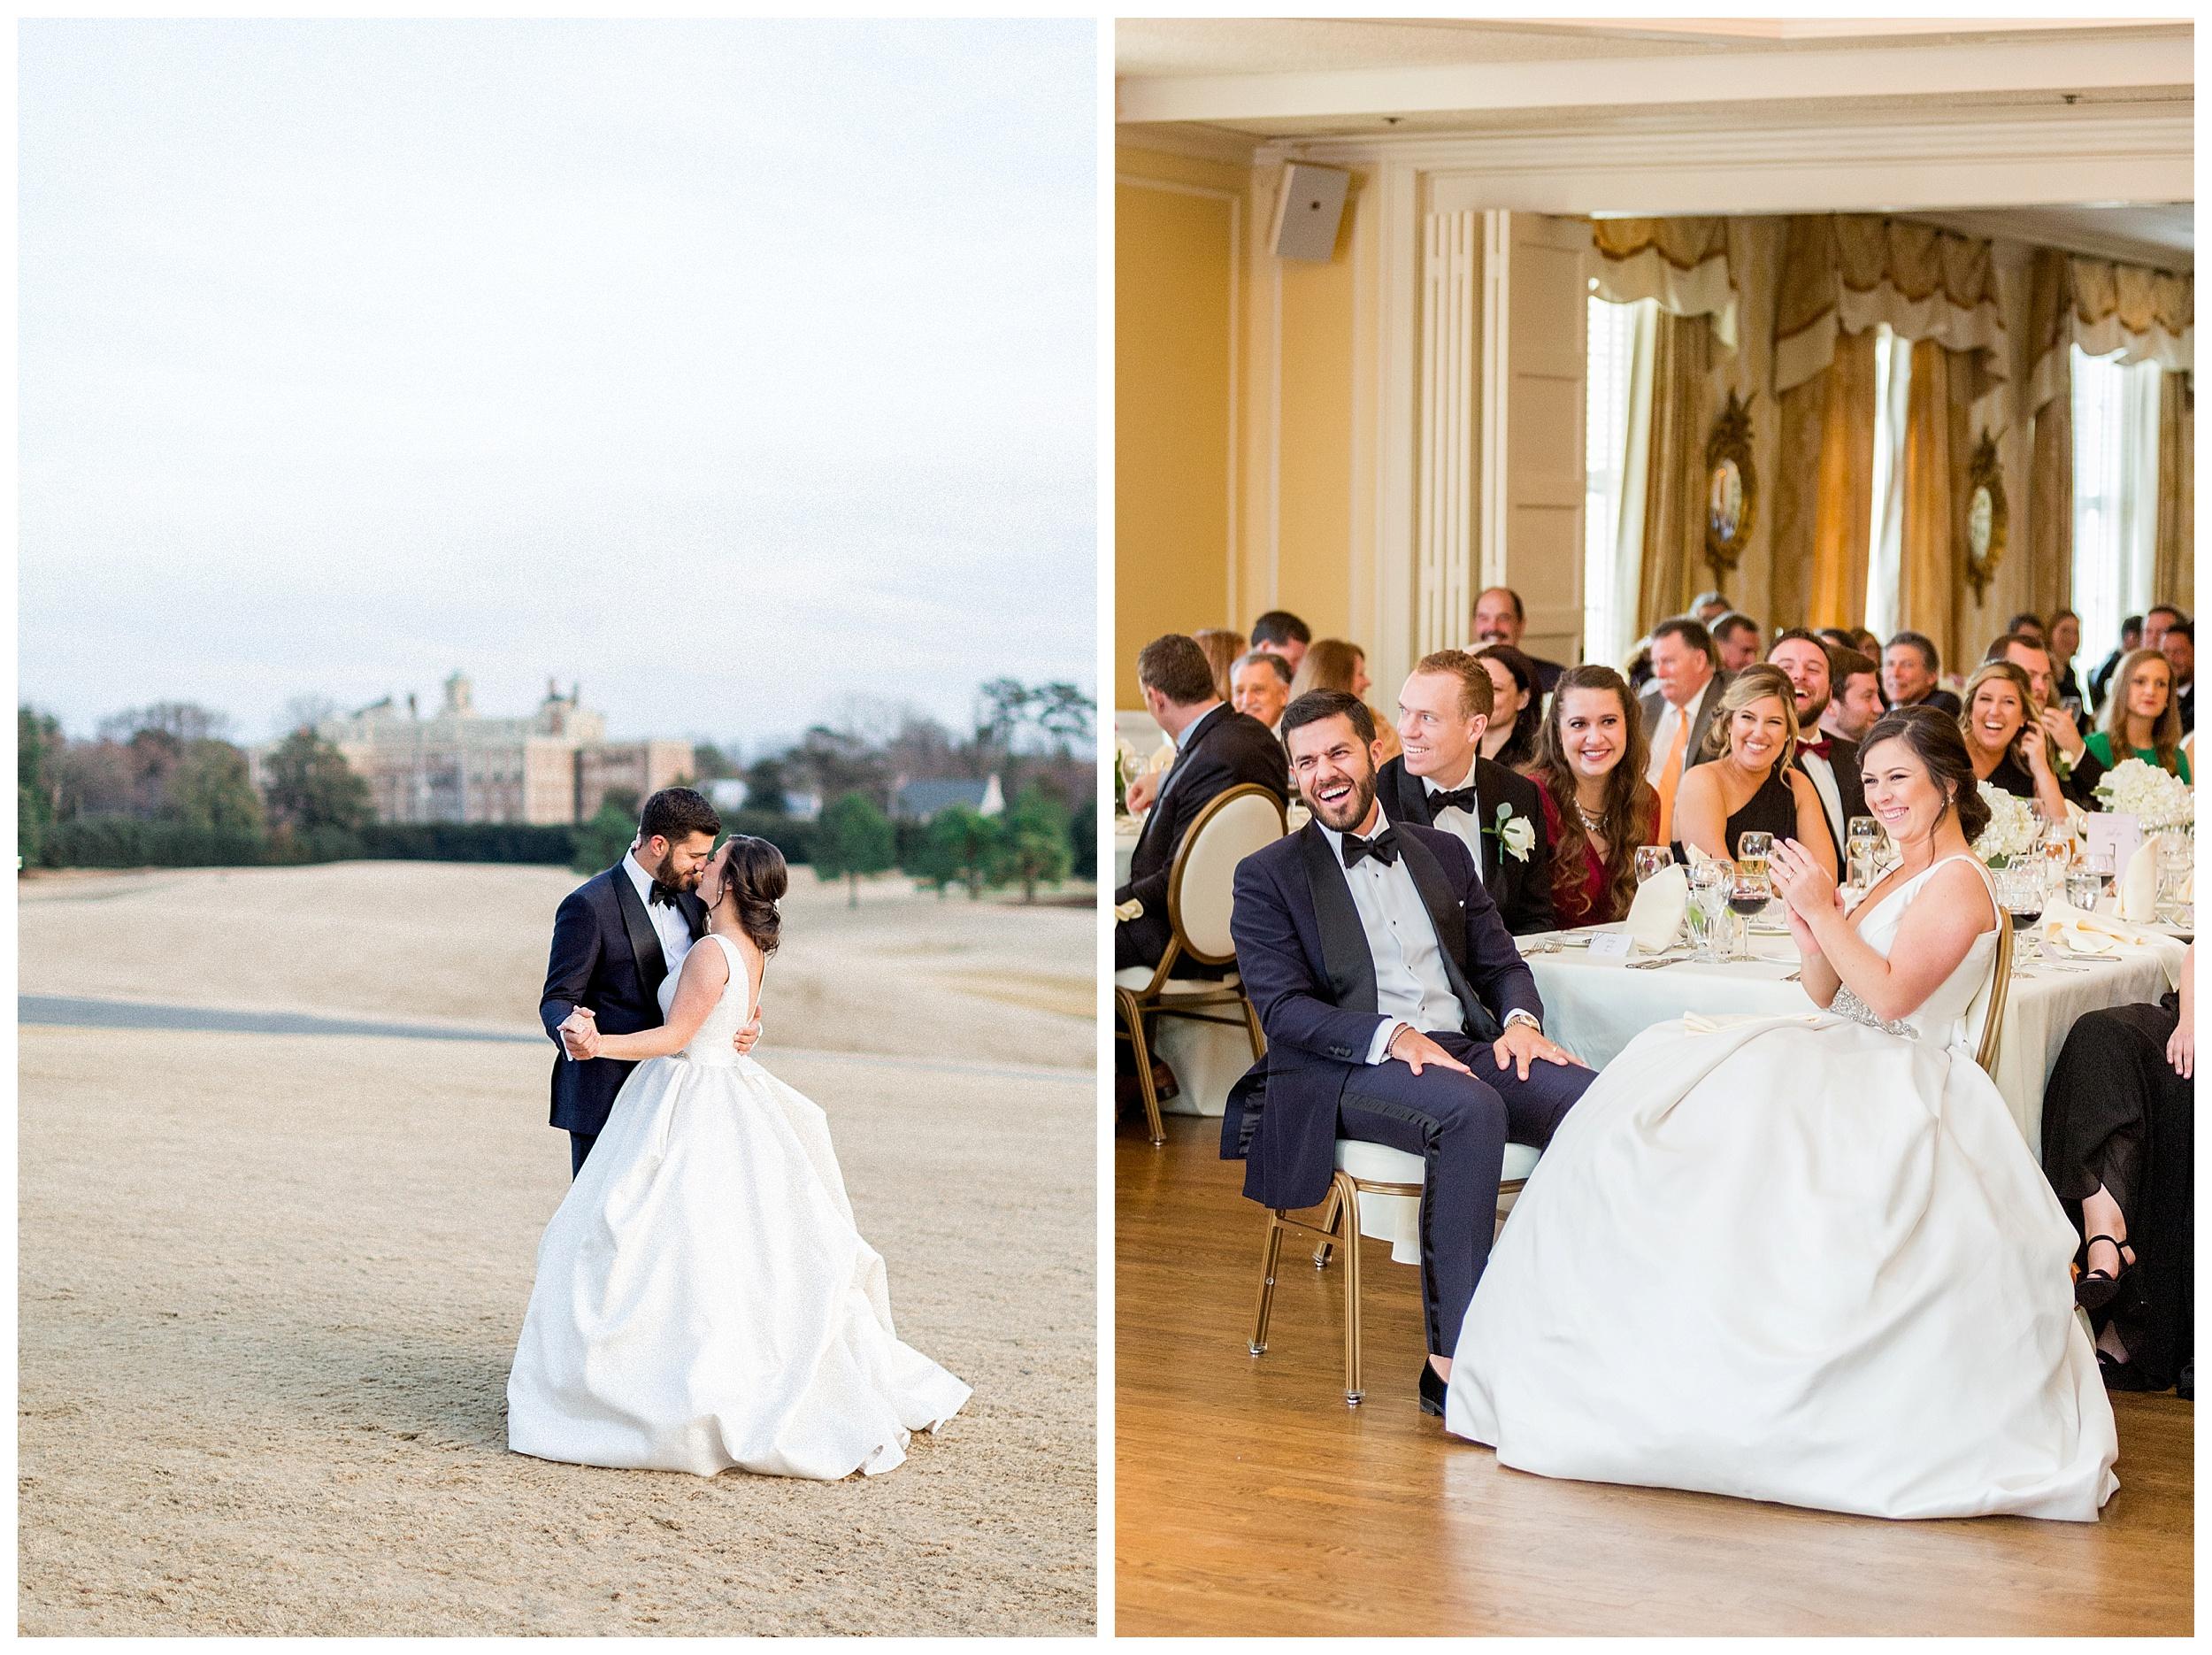 Country Club of Virginia Wedding | Richmond Wedding Photographer_0146.jpg